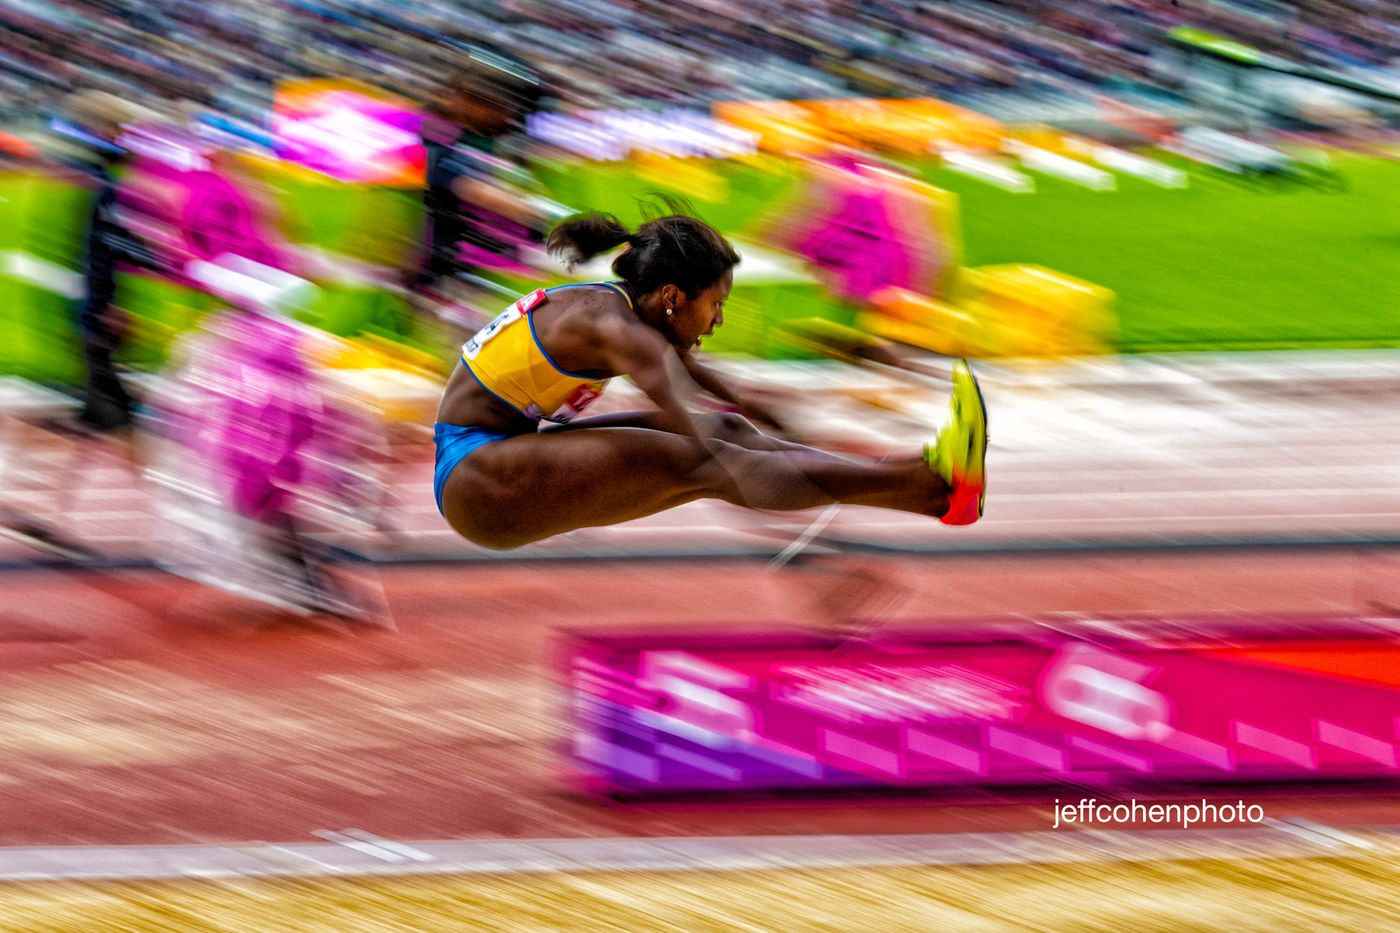 2017-IAAF-WC-London-sagna-ljw-night-6382--jeff-cohen-photo--web.jpg